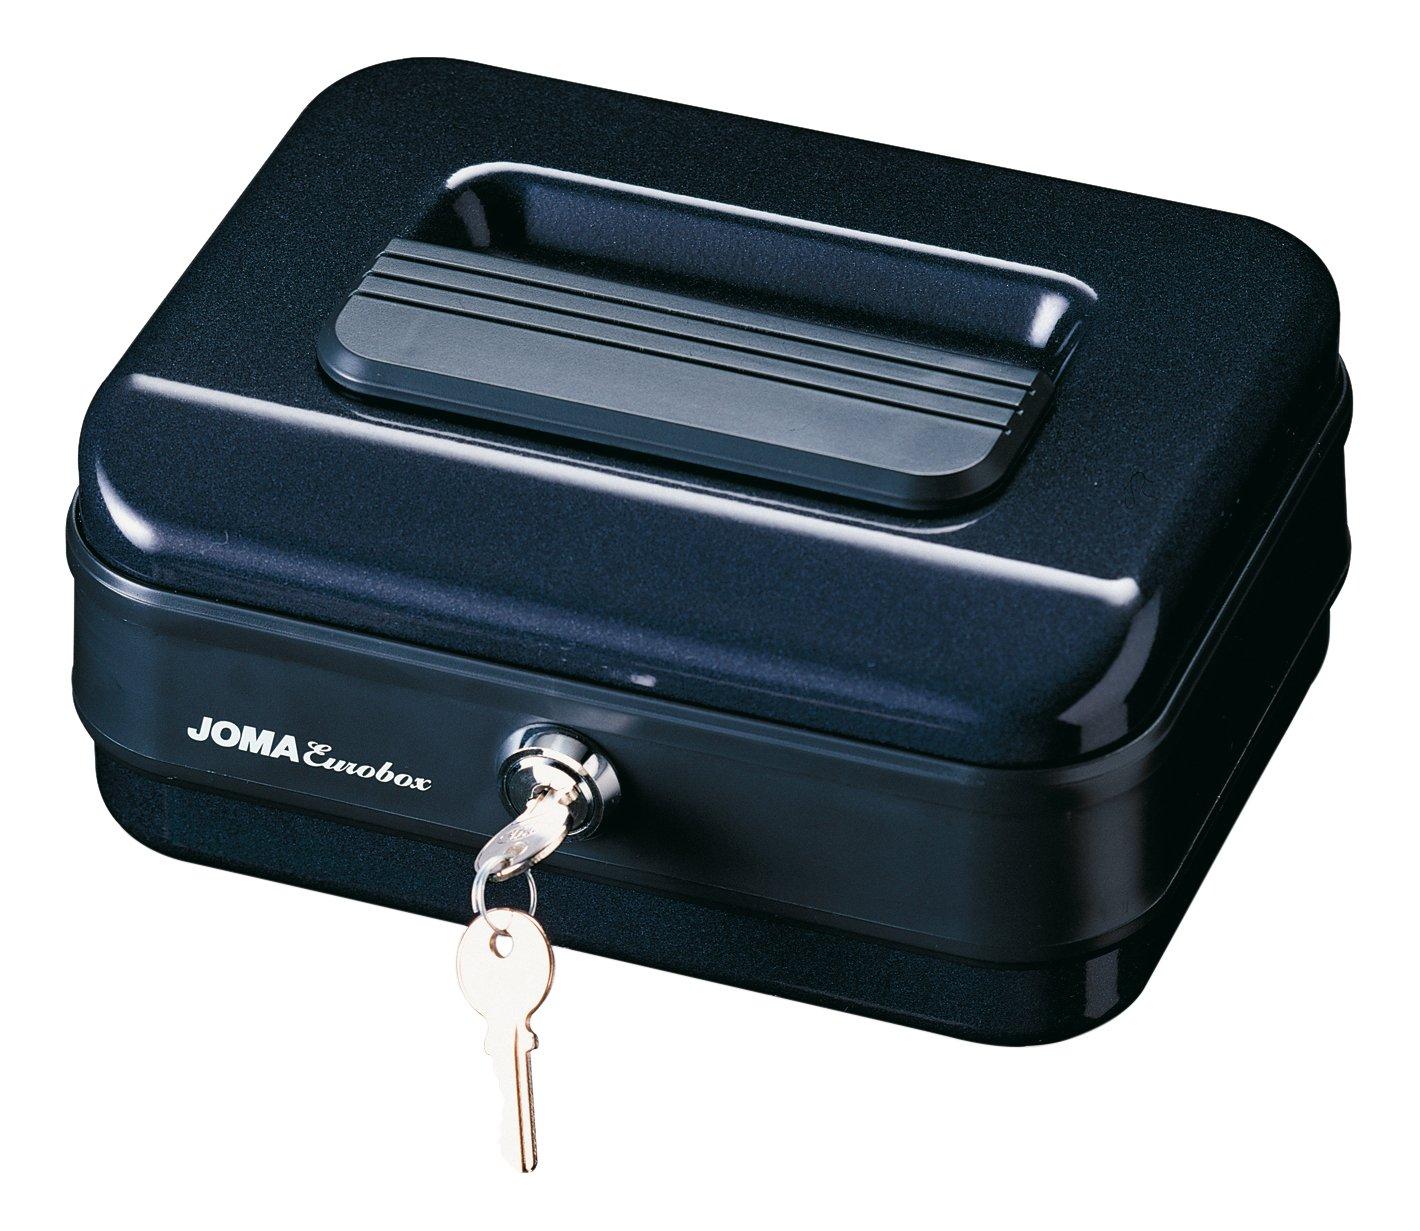 JOMA Geldkassette Eurobox nummer 2, blau, CCE10066